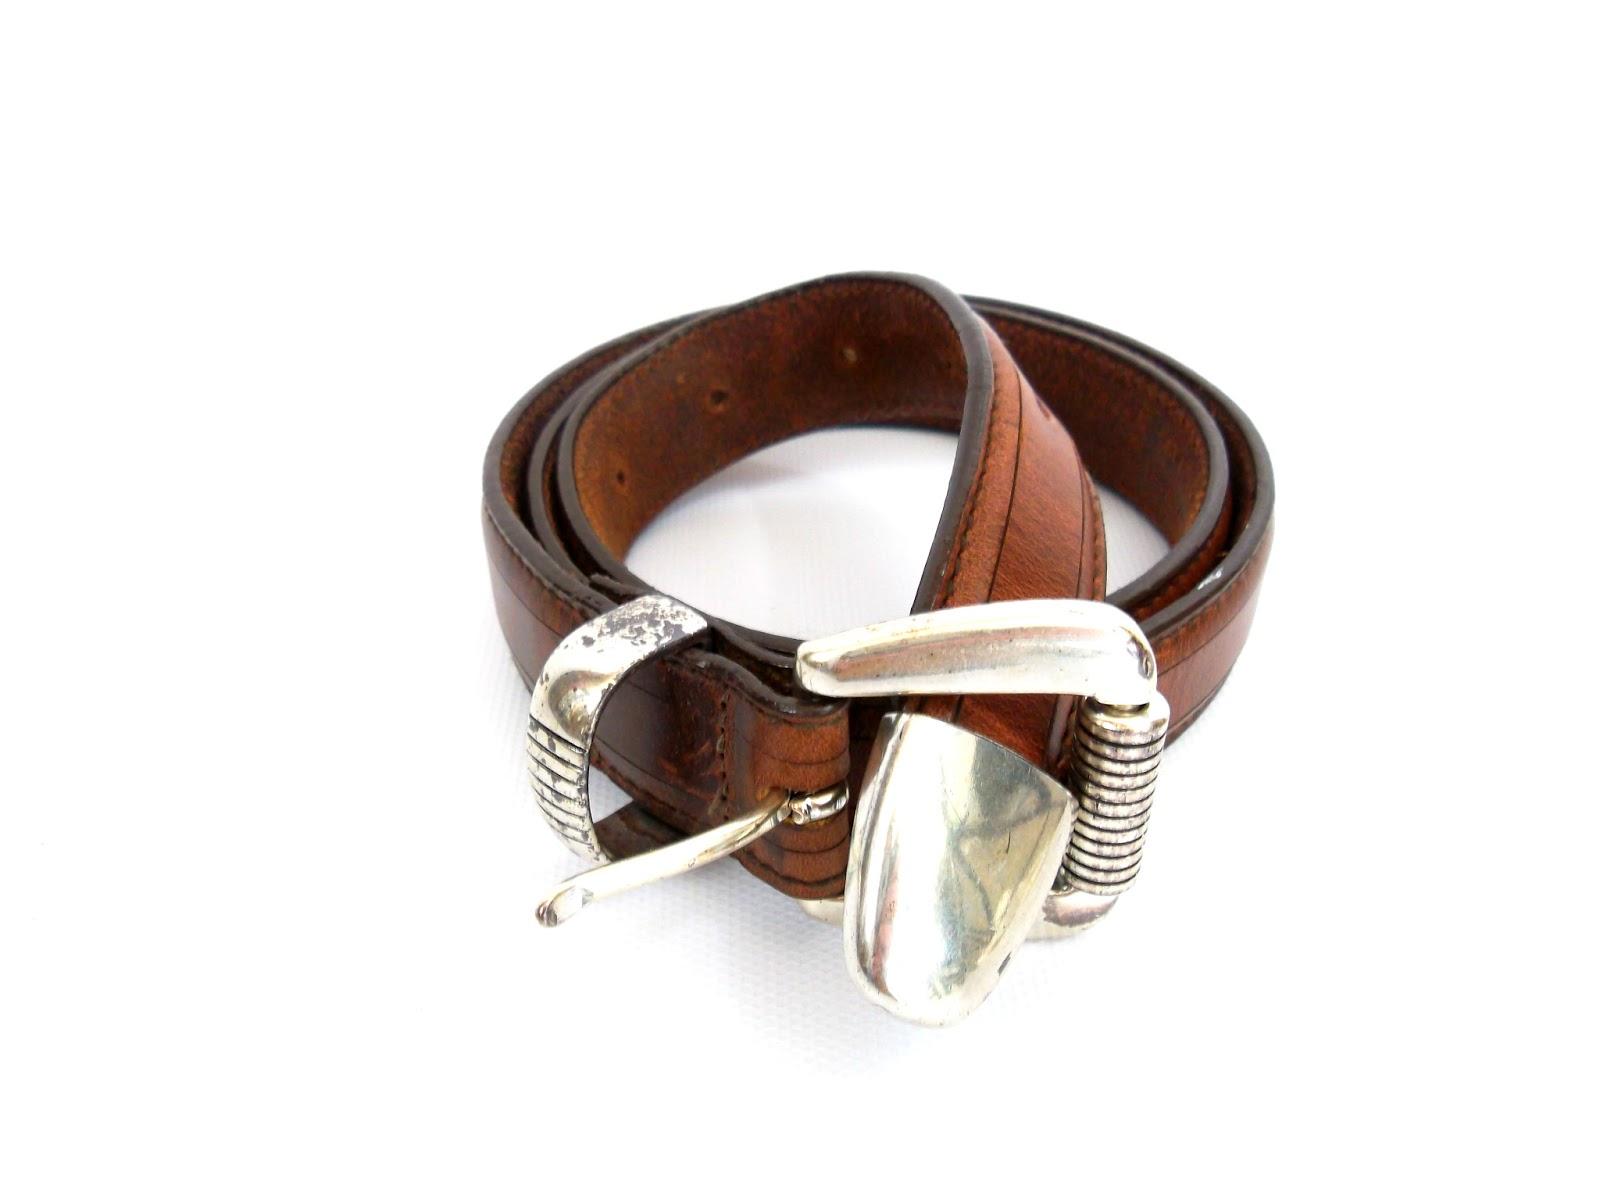 foxburrow vintage leather belt